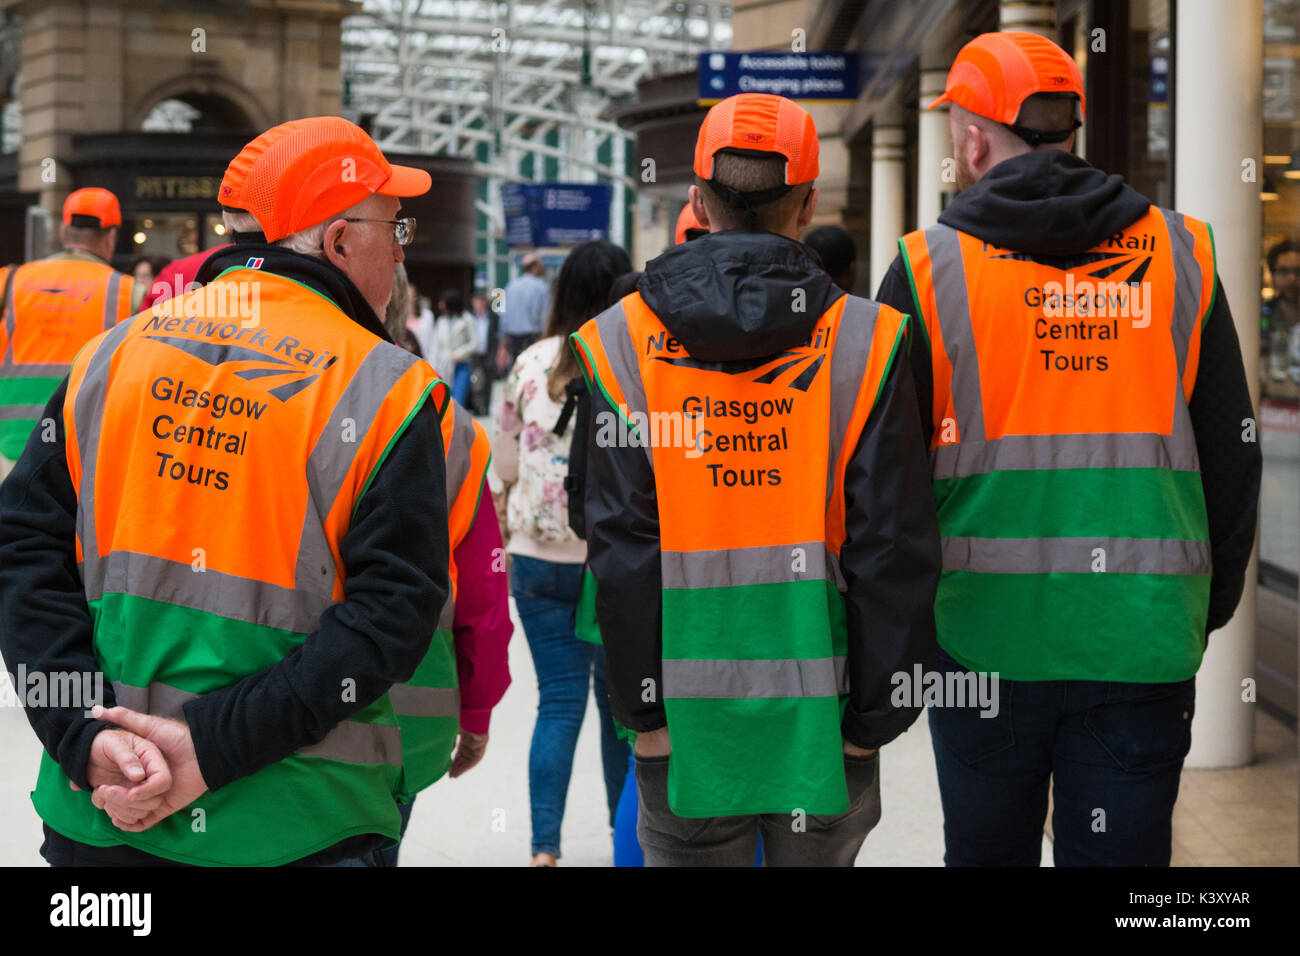 Glasgow Central Station Tour - Menschen am Anfang der Tour Stockbild